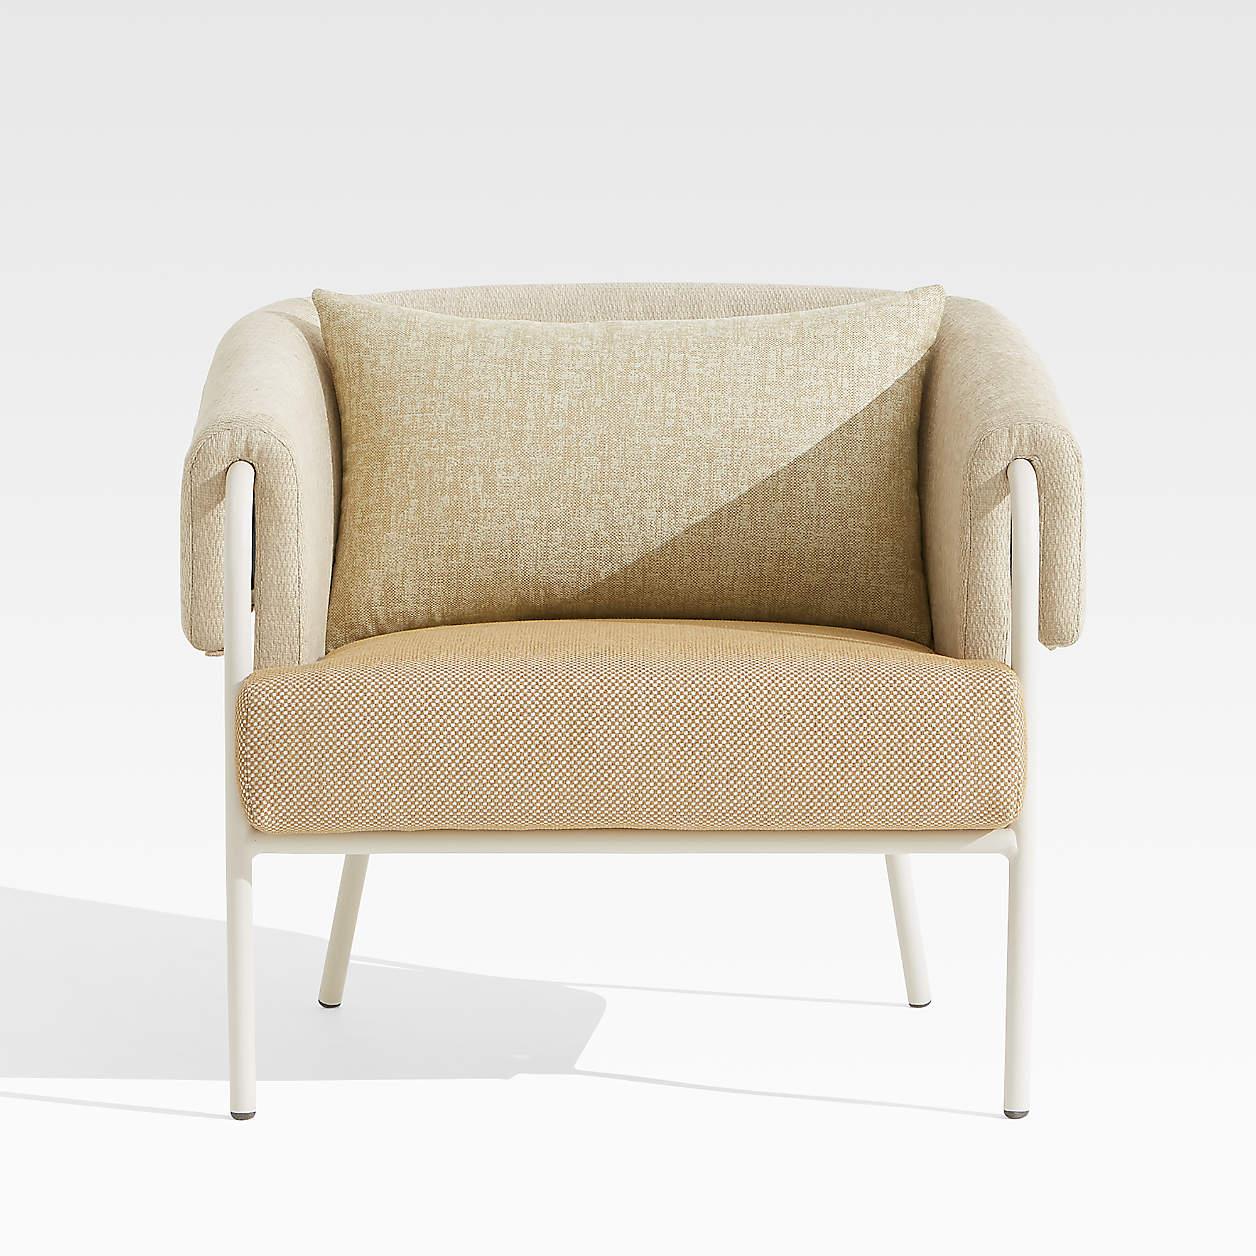 campana-outdoor-lounge-chair